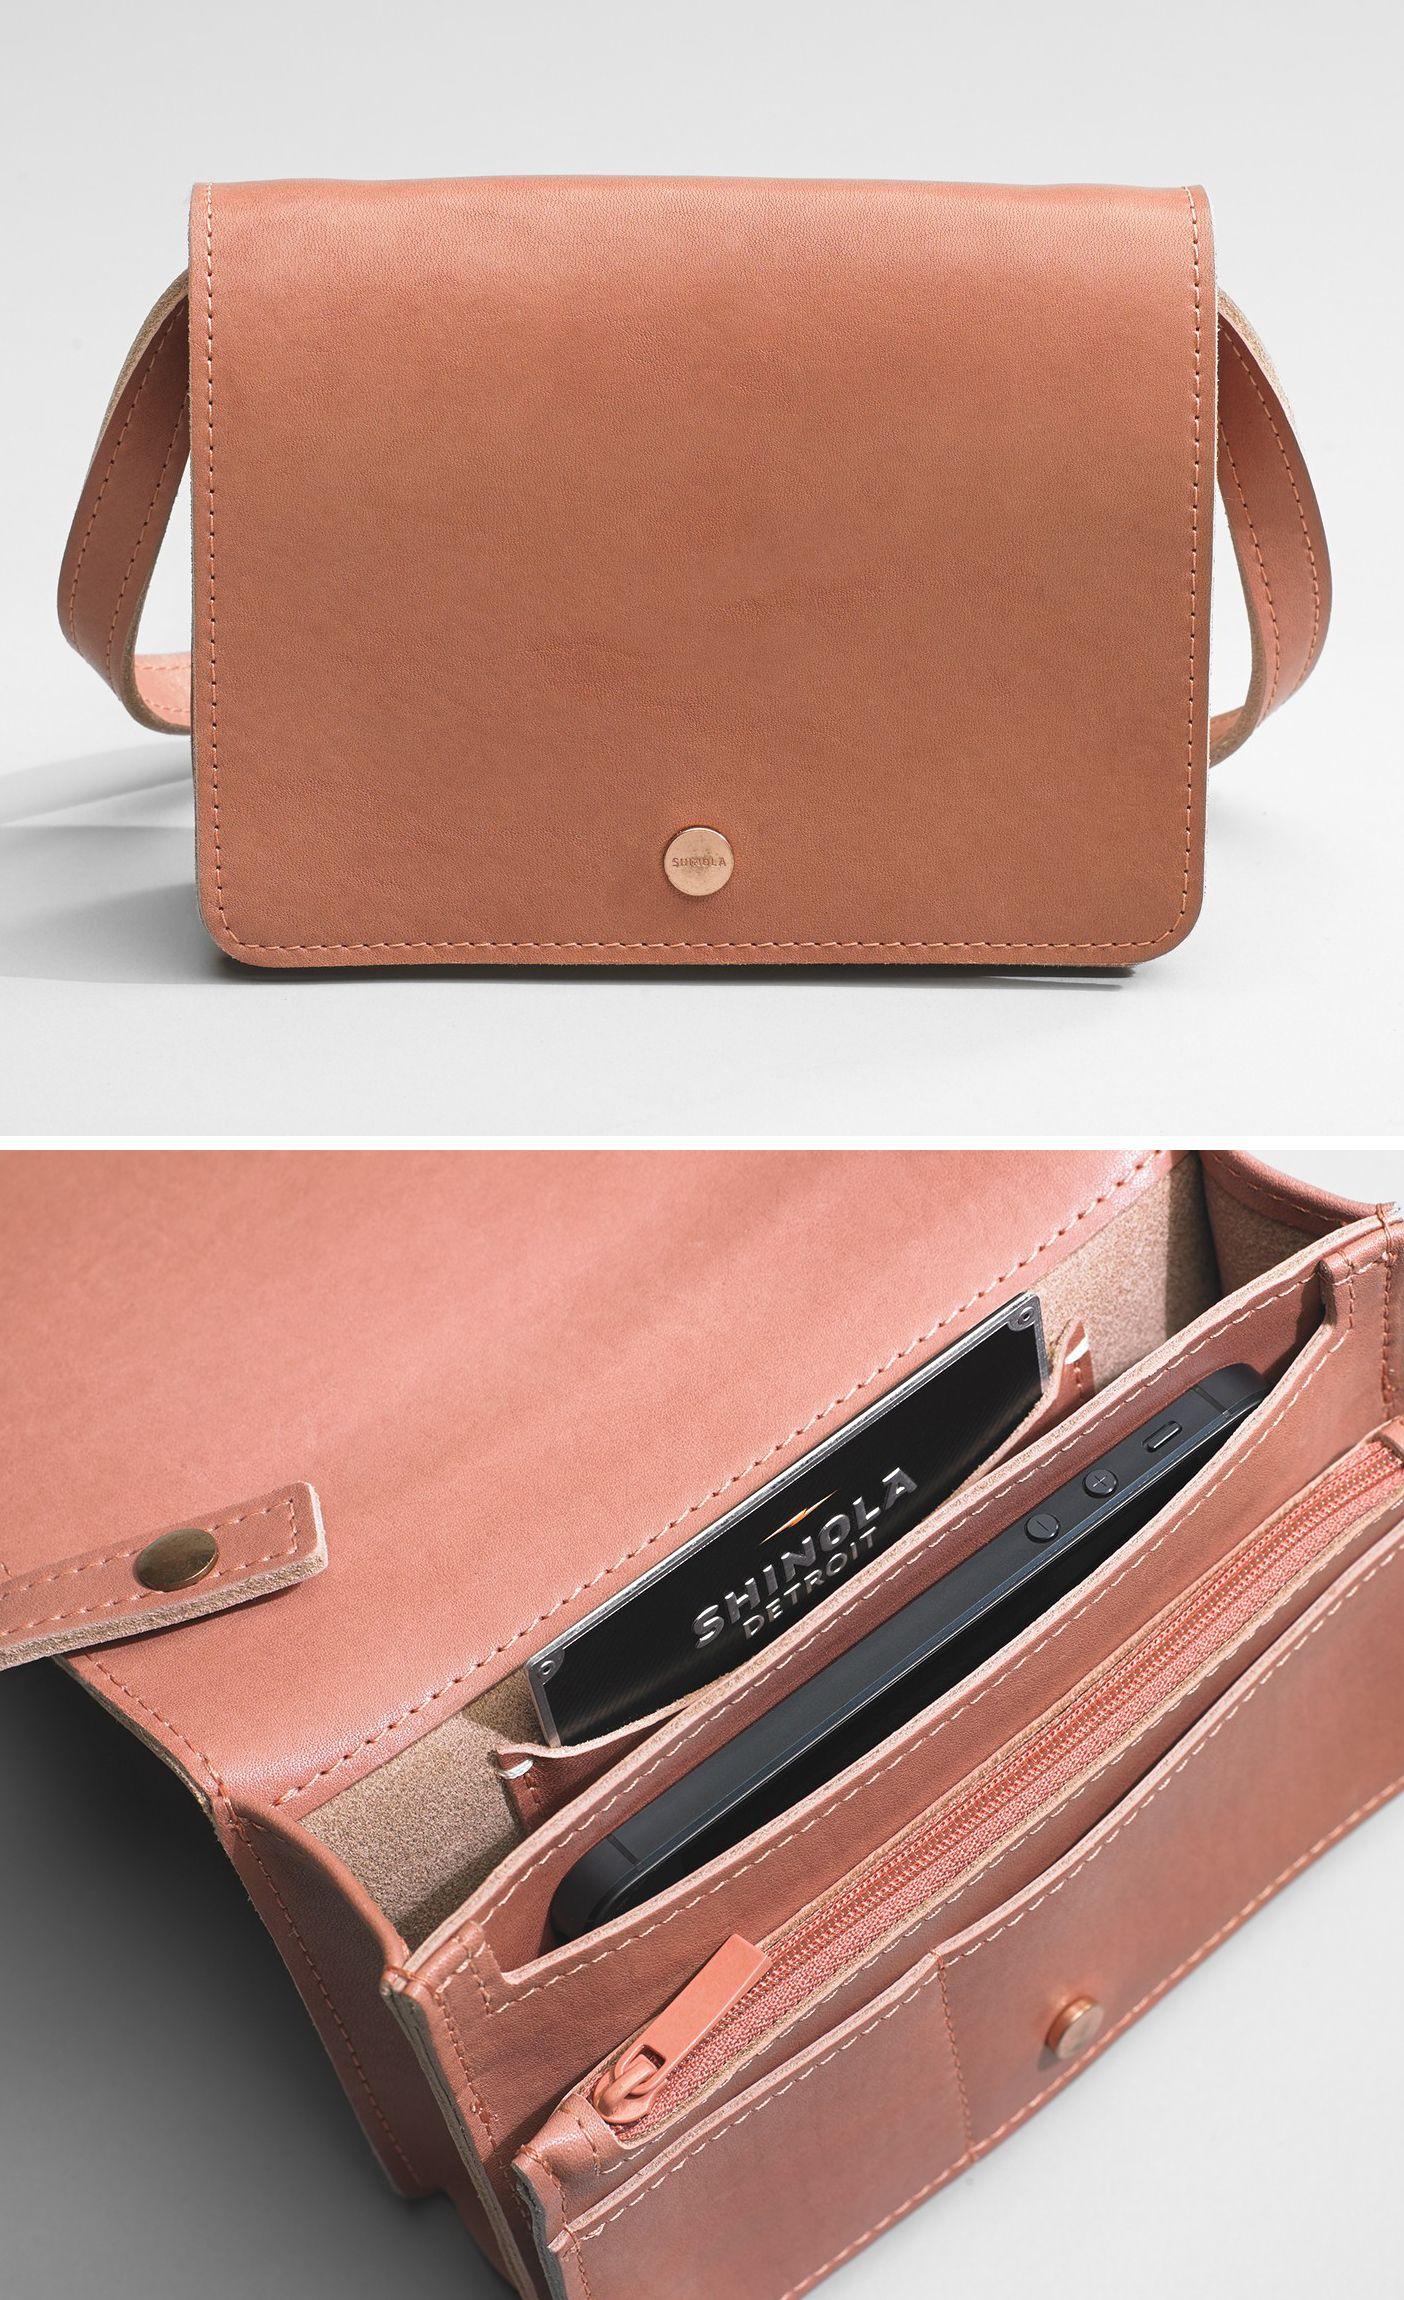 Handsewn Leather Crossbody Bag